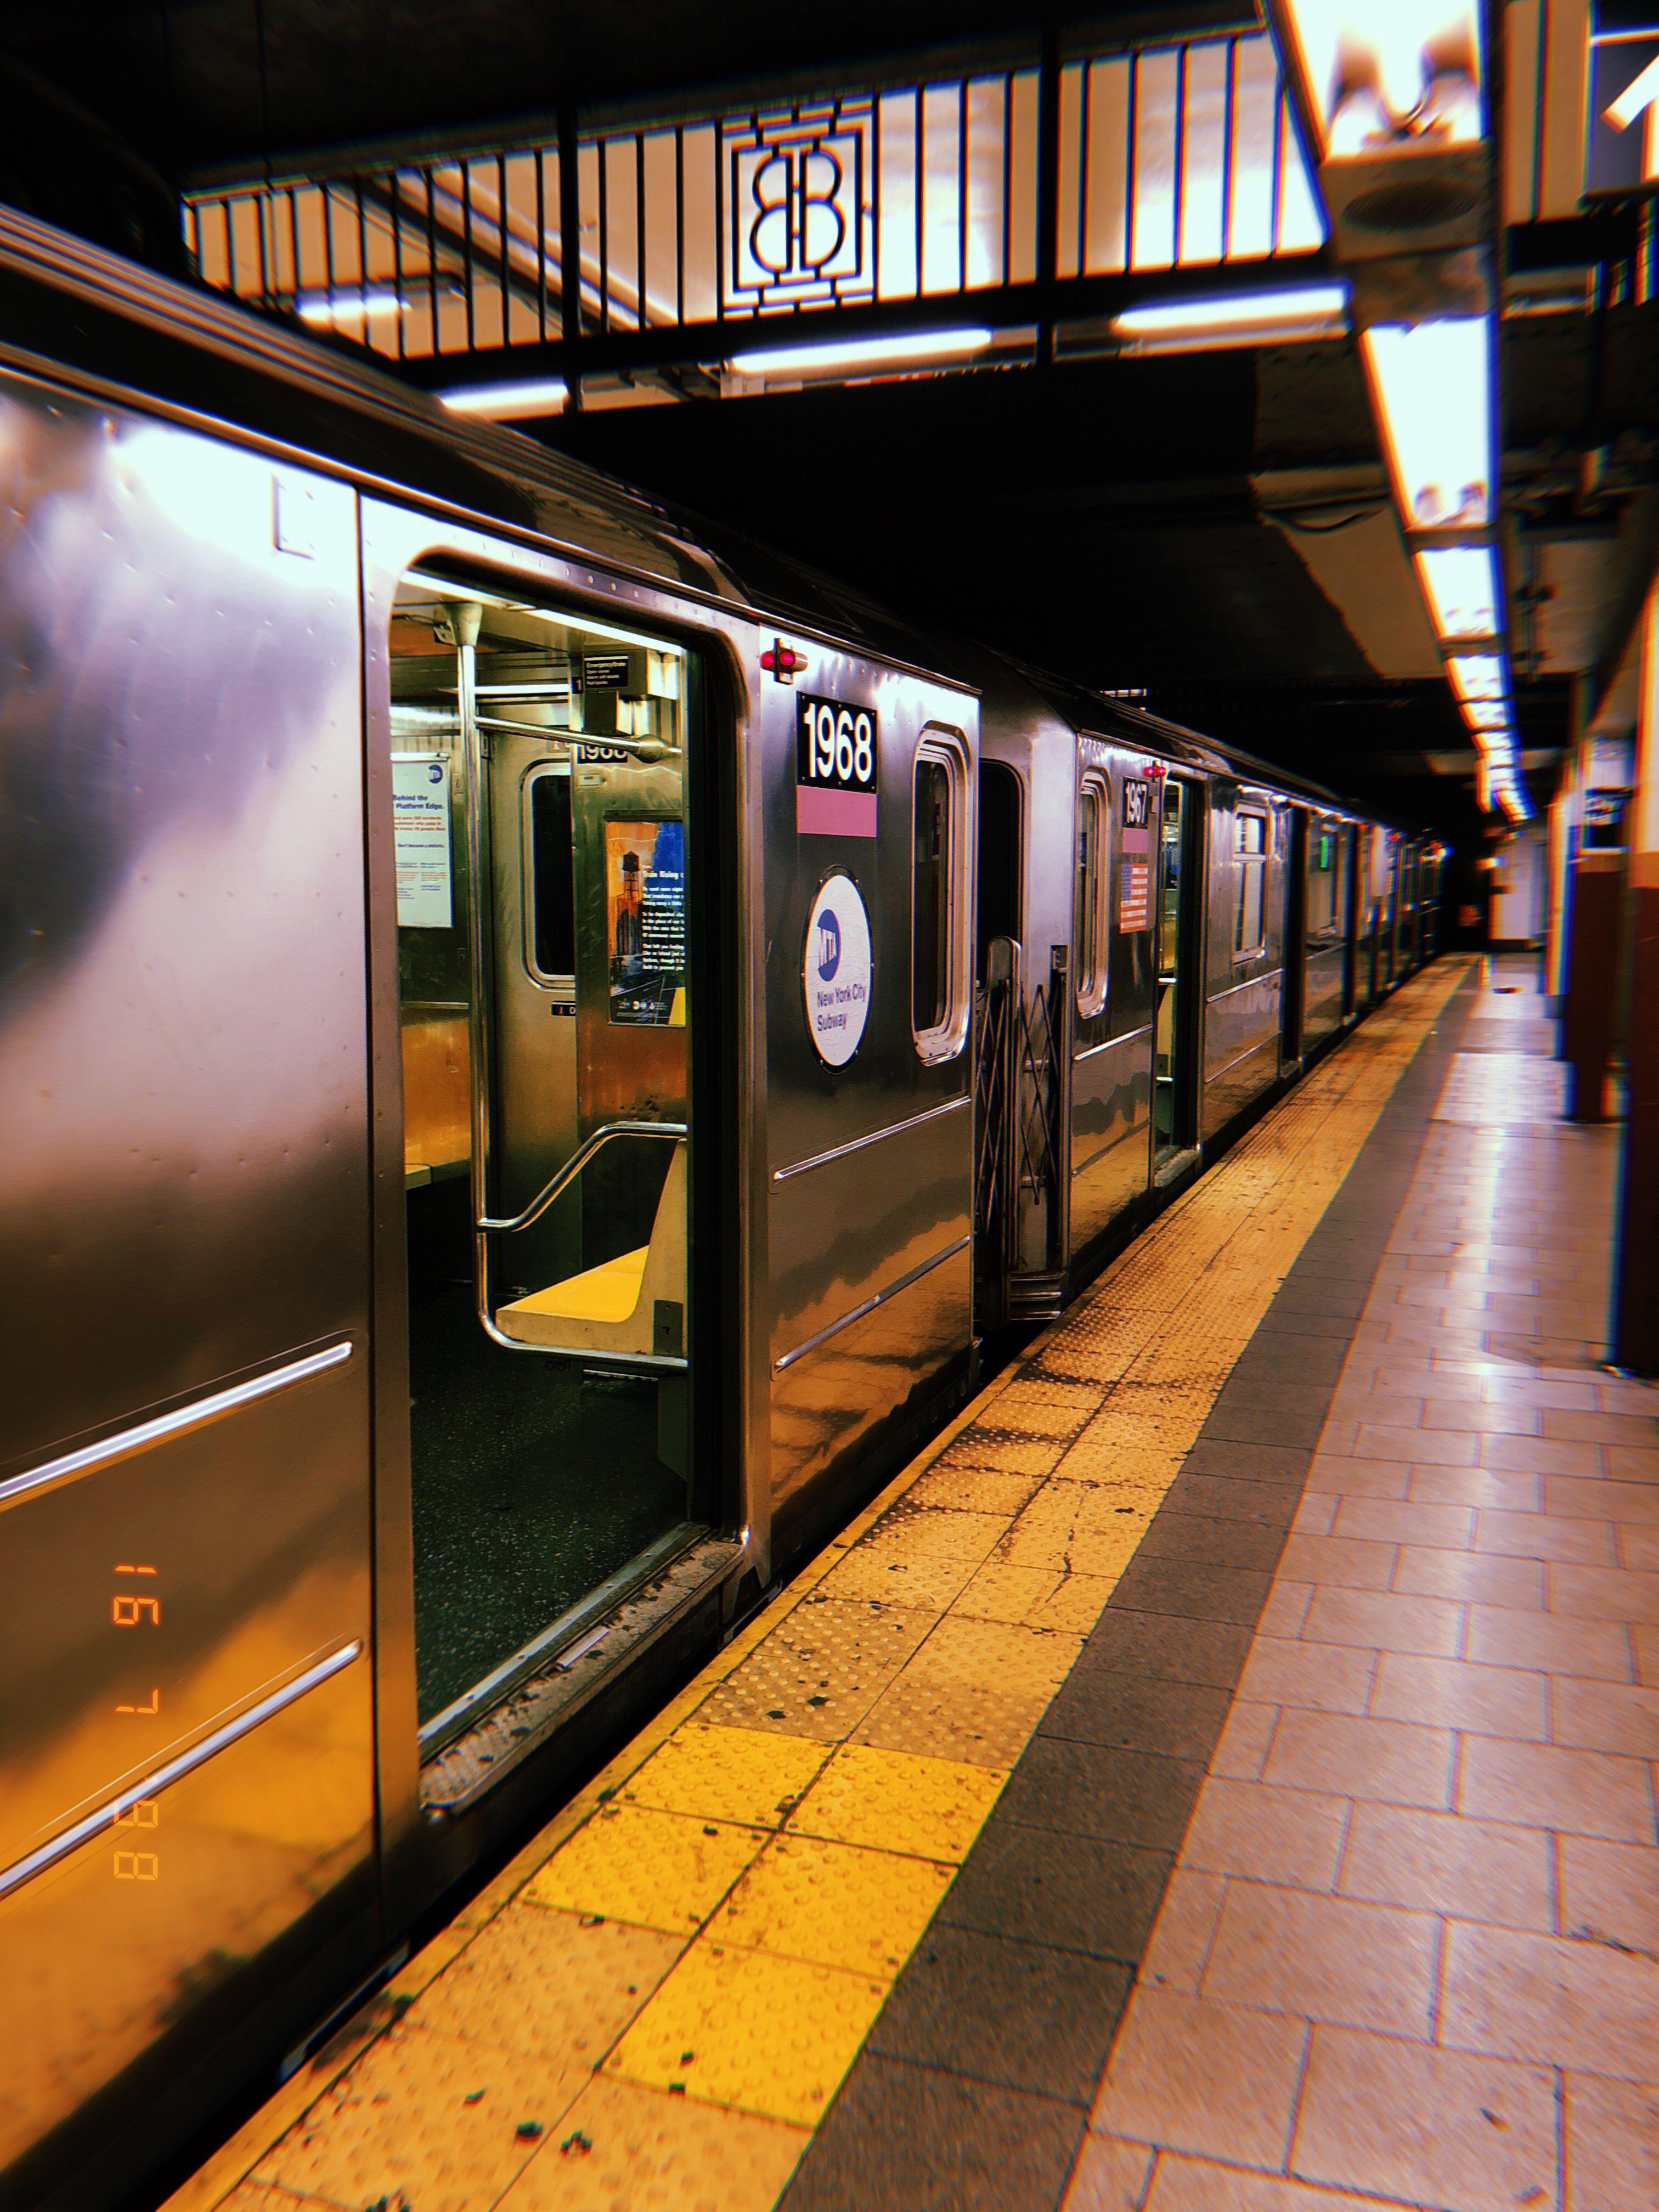 New Yor New York Subway Nyc Subway London Photography